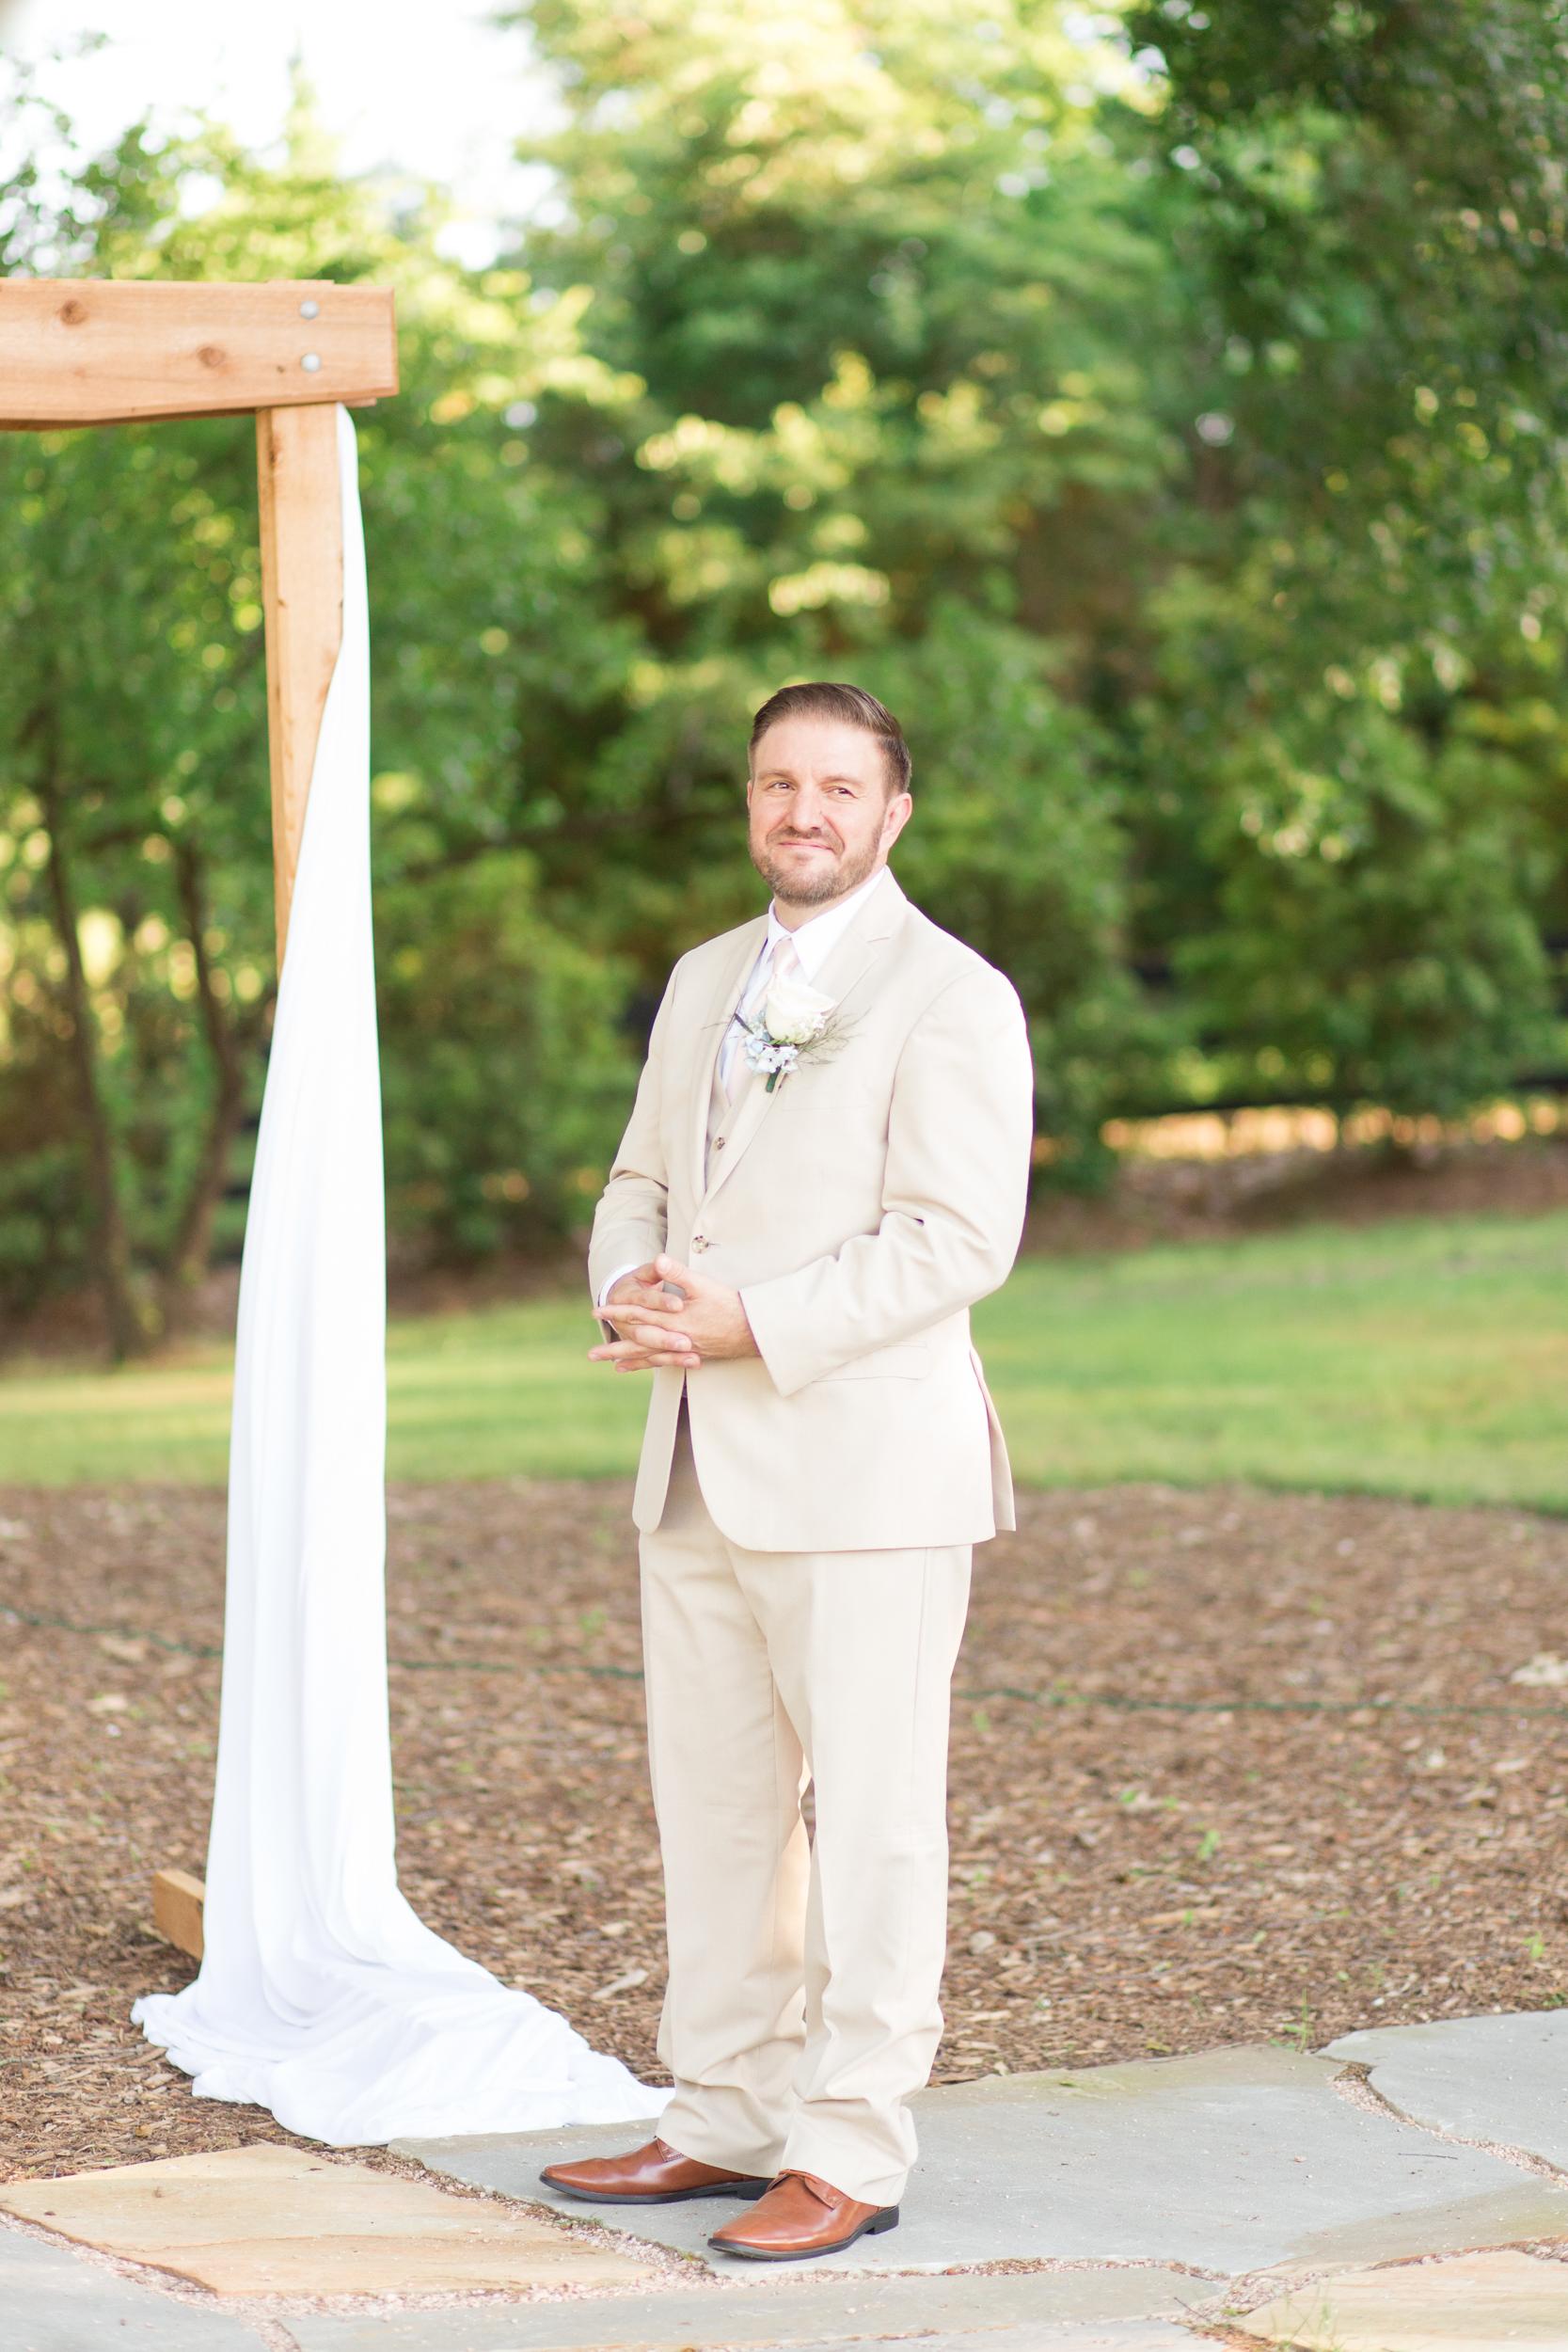 Zihlman-East TX Wedding_Kelsie Hendricks Photography_The Folmar Tyler Texas-99.jpg